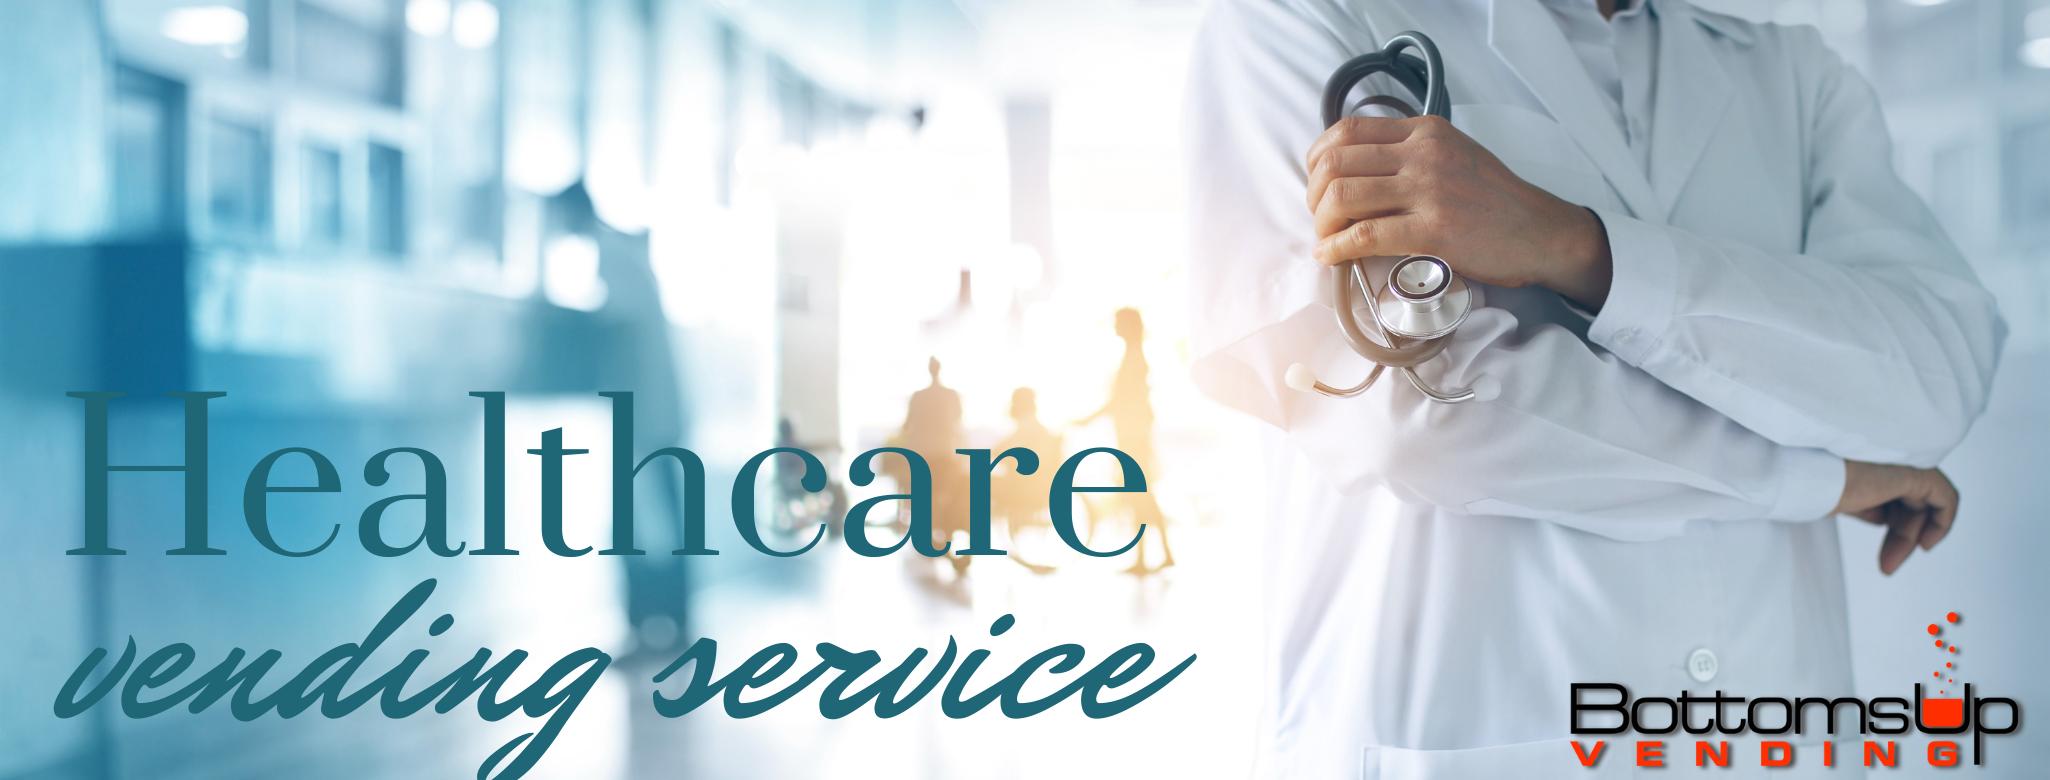 Healthcare vending services